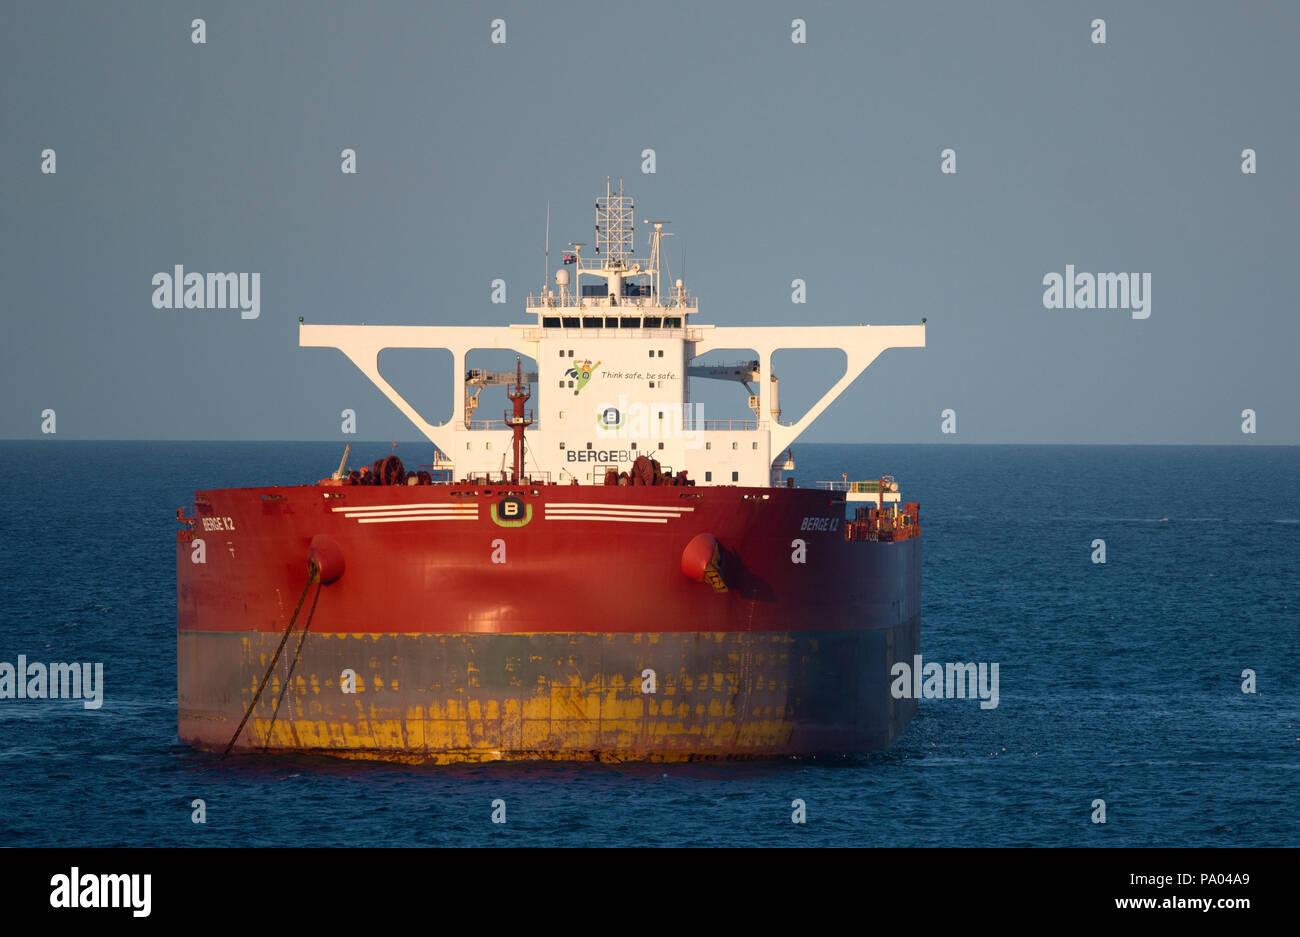 Ships& People - Stock Image